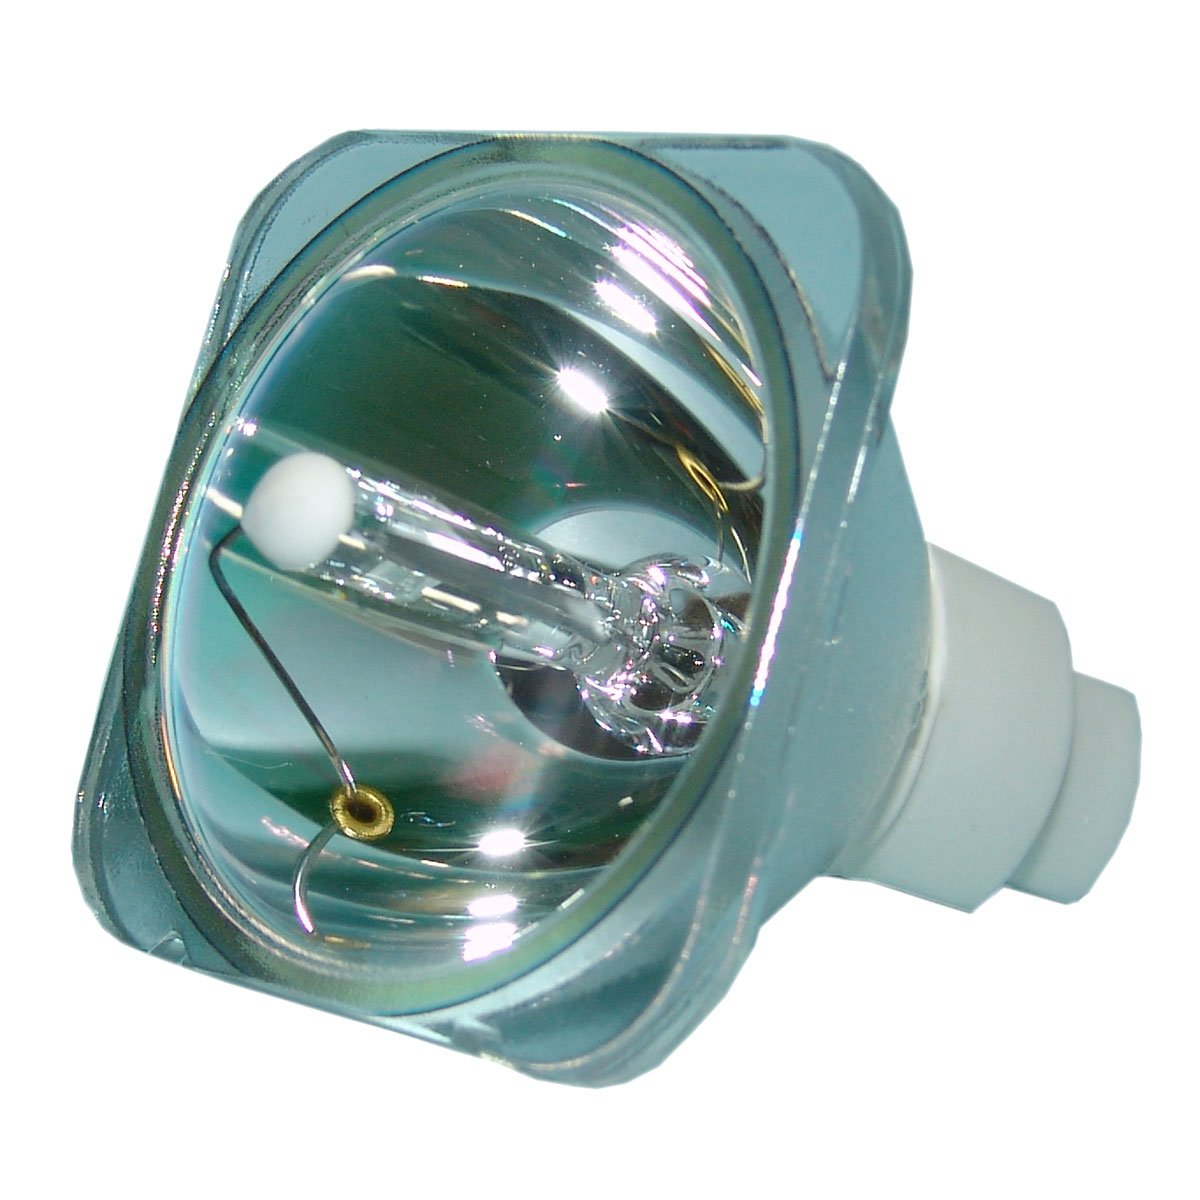 Lutema プロジェクター交換用ランプ ハウジング/電球付き Optoma OPX4100用 Economy Economy Lamp Only B07NC5Q3MW